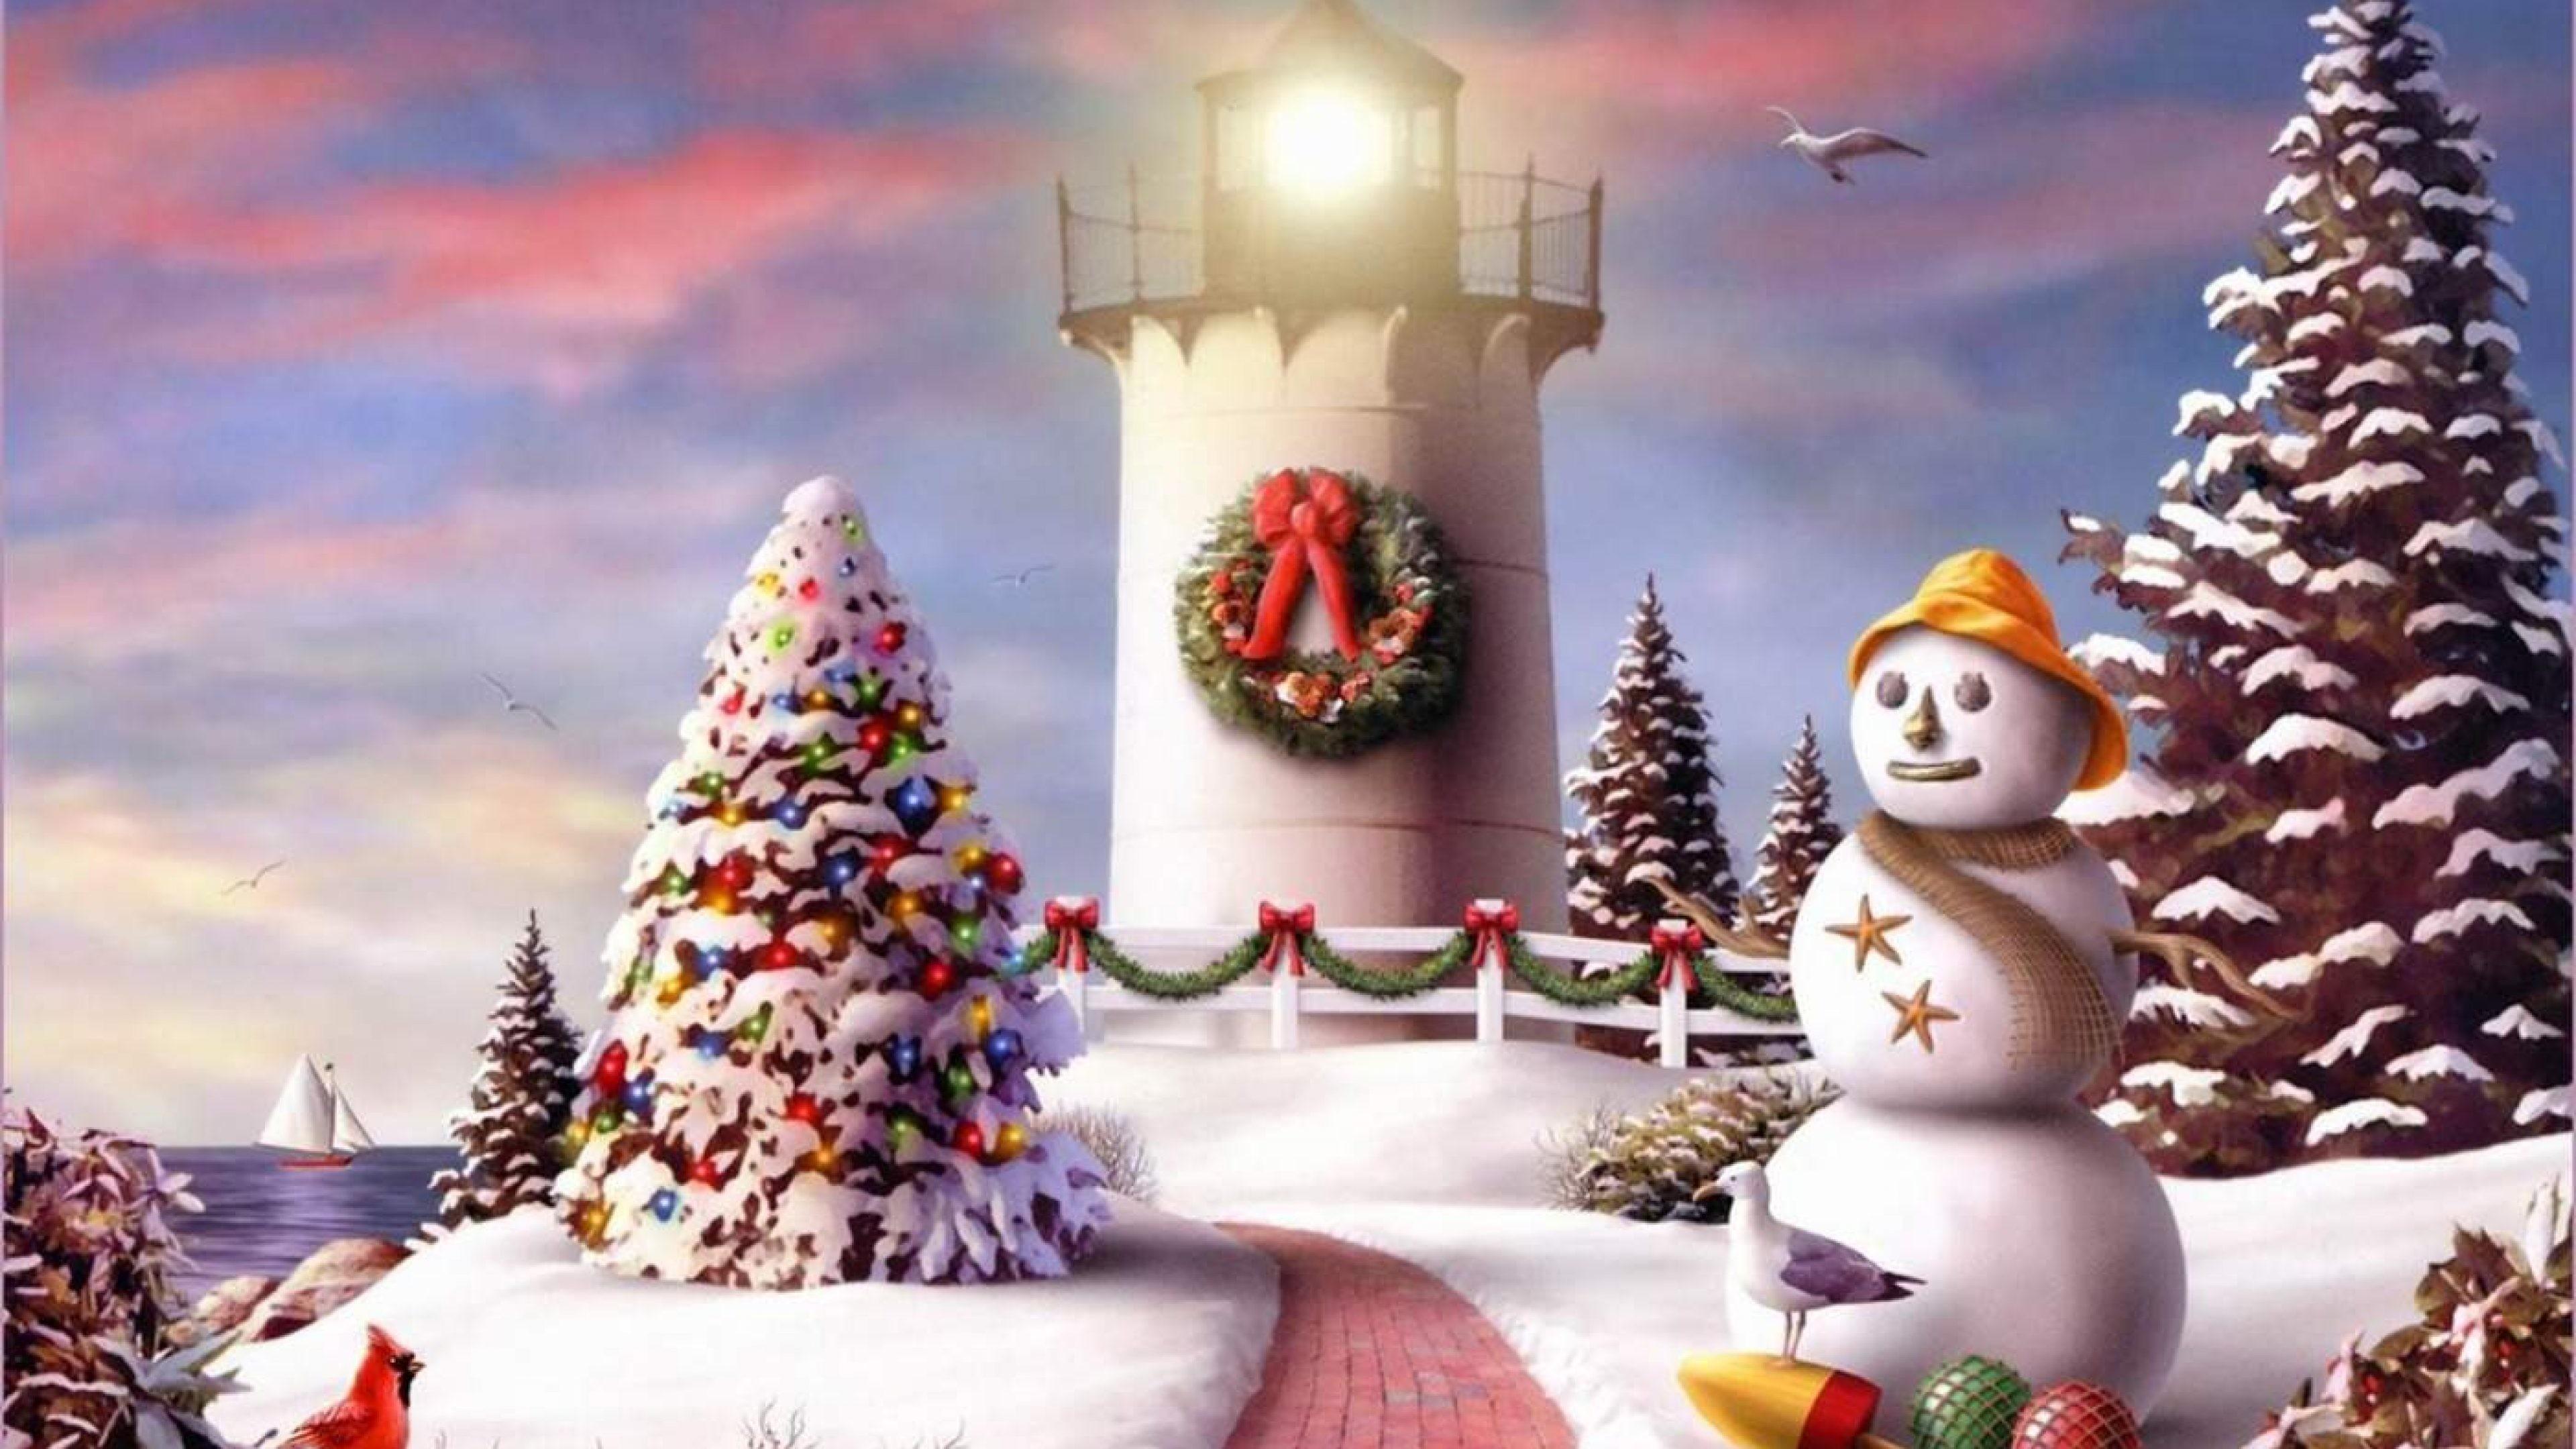 Free Christmas Desktop Wallpaper Background